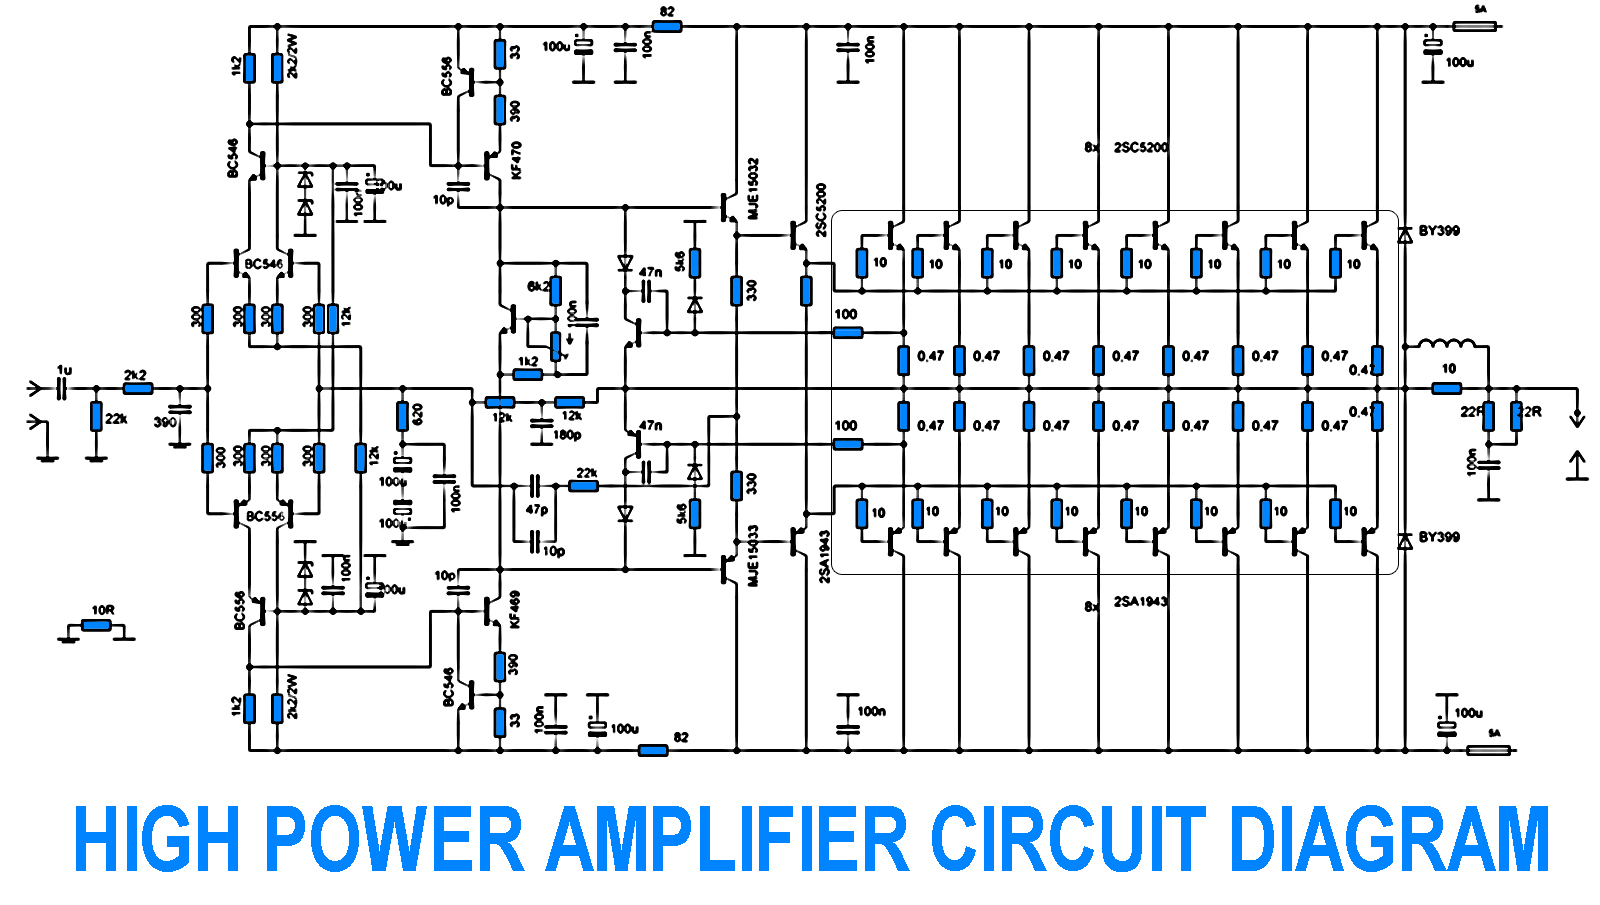 medium resolution of at amp t wiring diagram wiring diagram schematics amp wiring chart at amp t wiring diagram